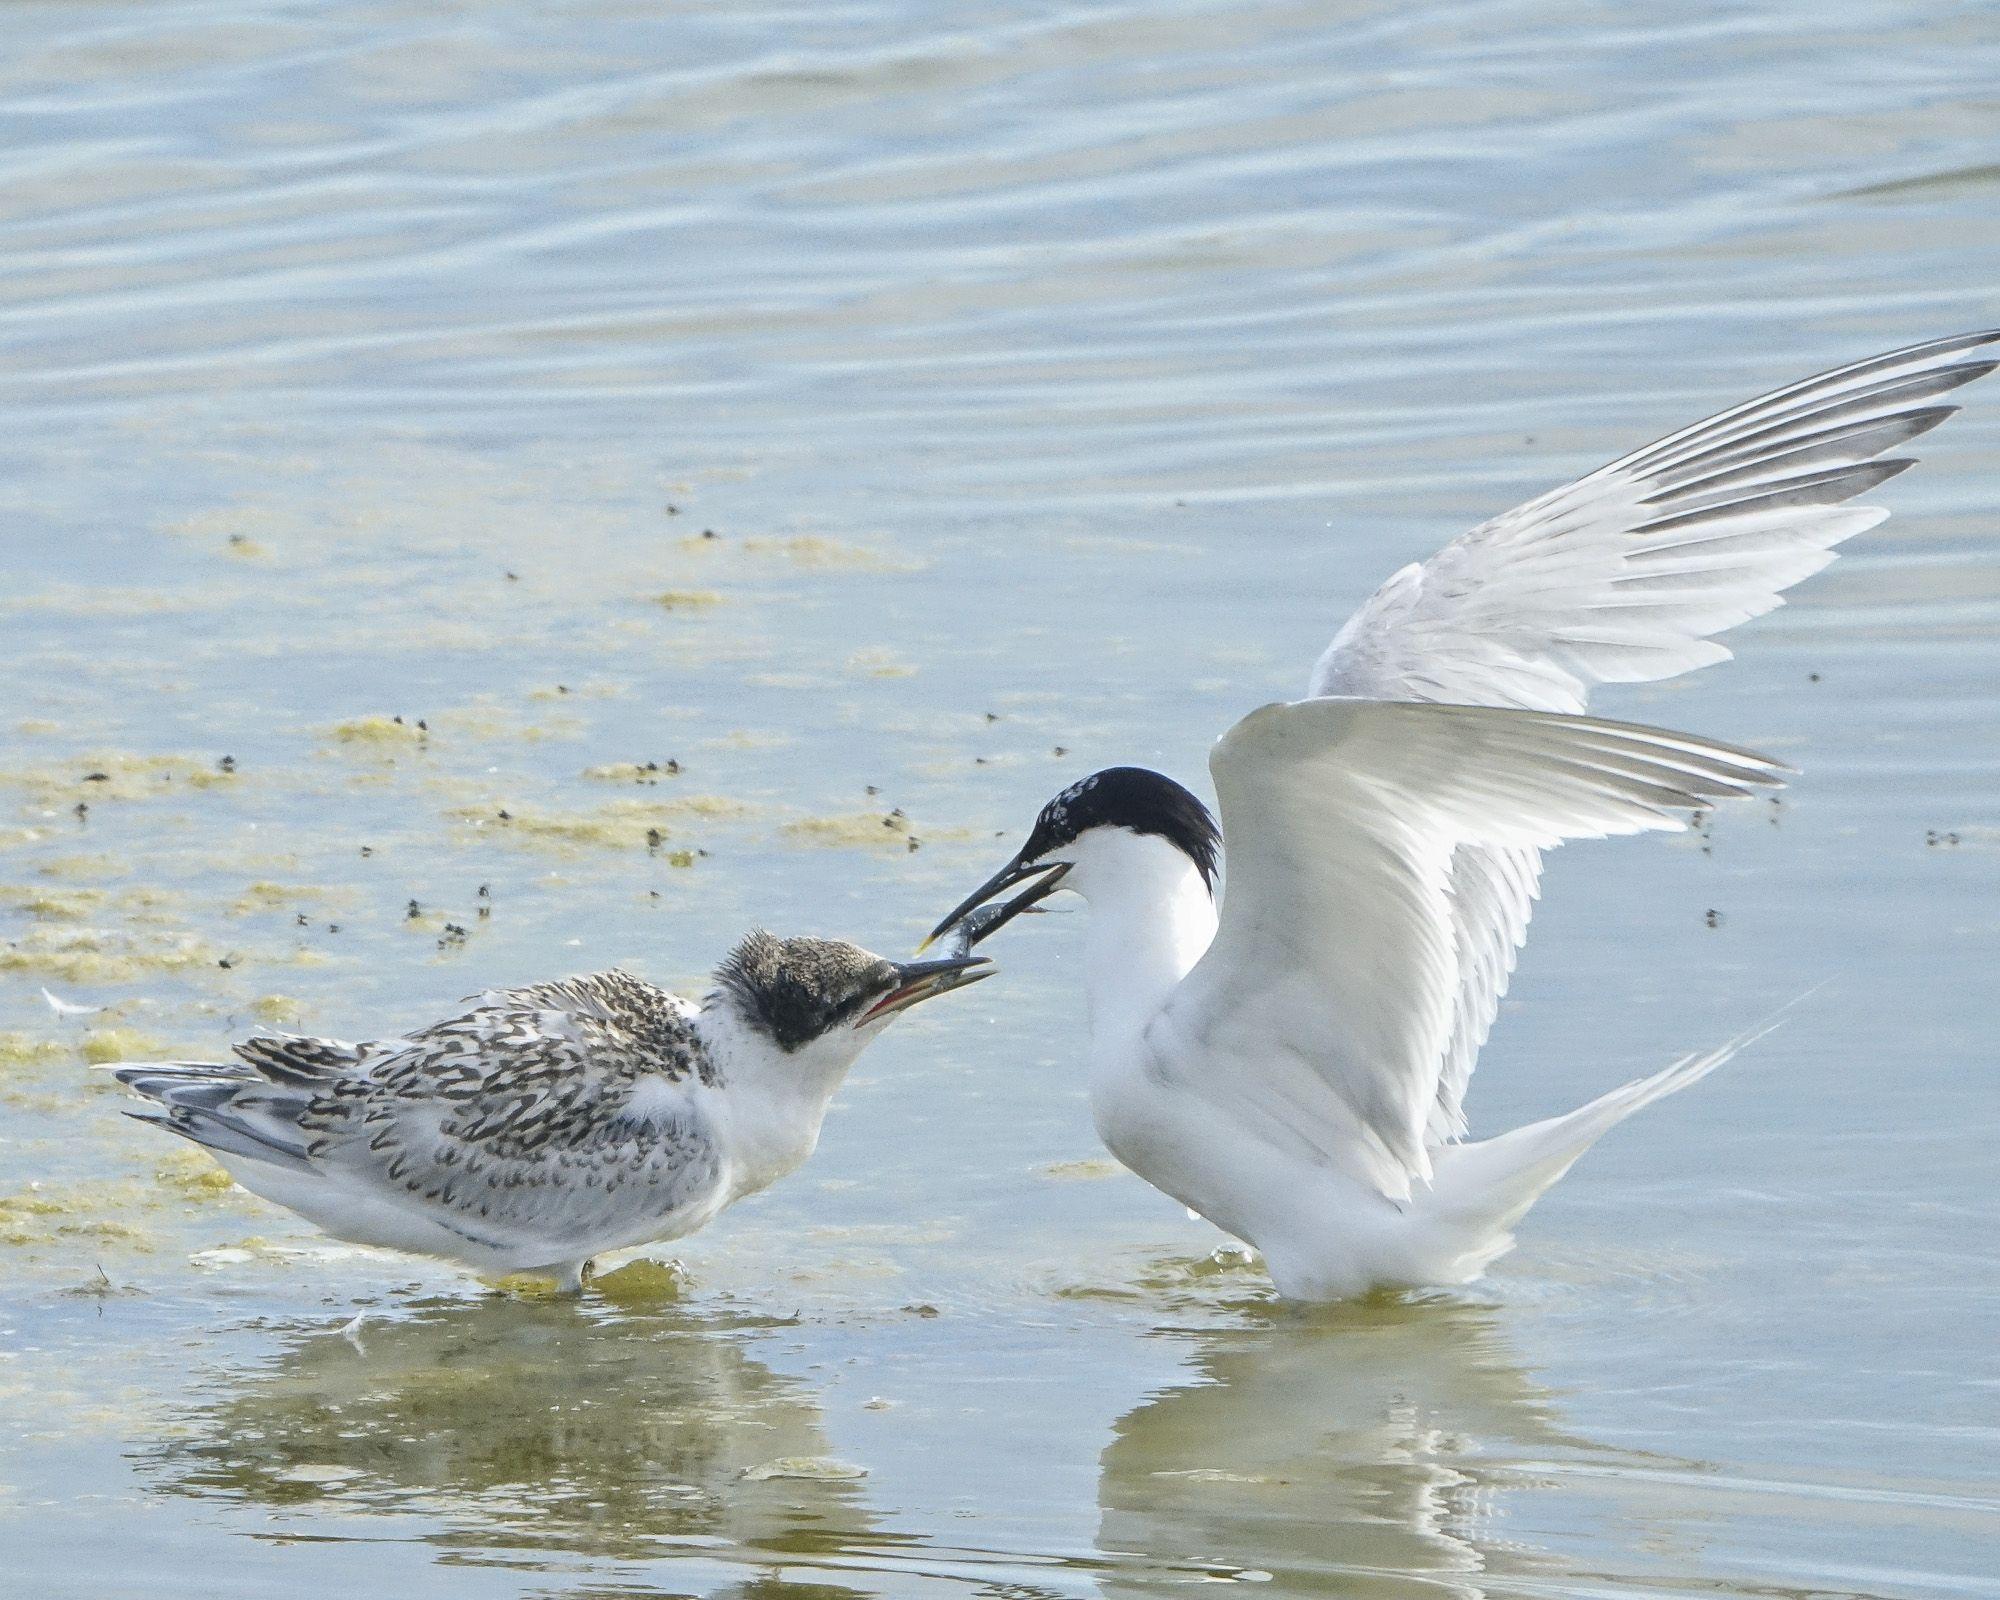 Sandwich tern feeding its chick 02543